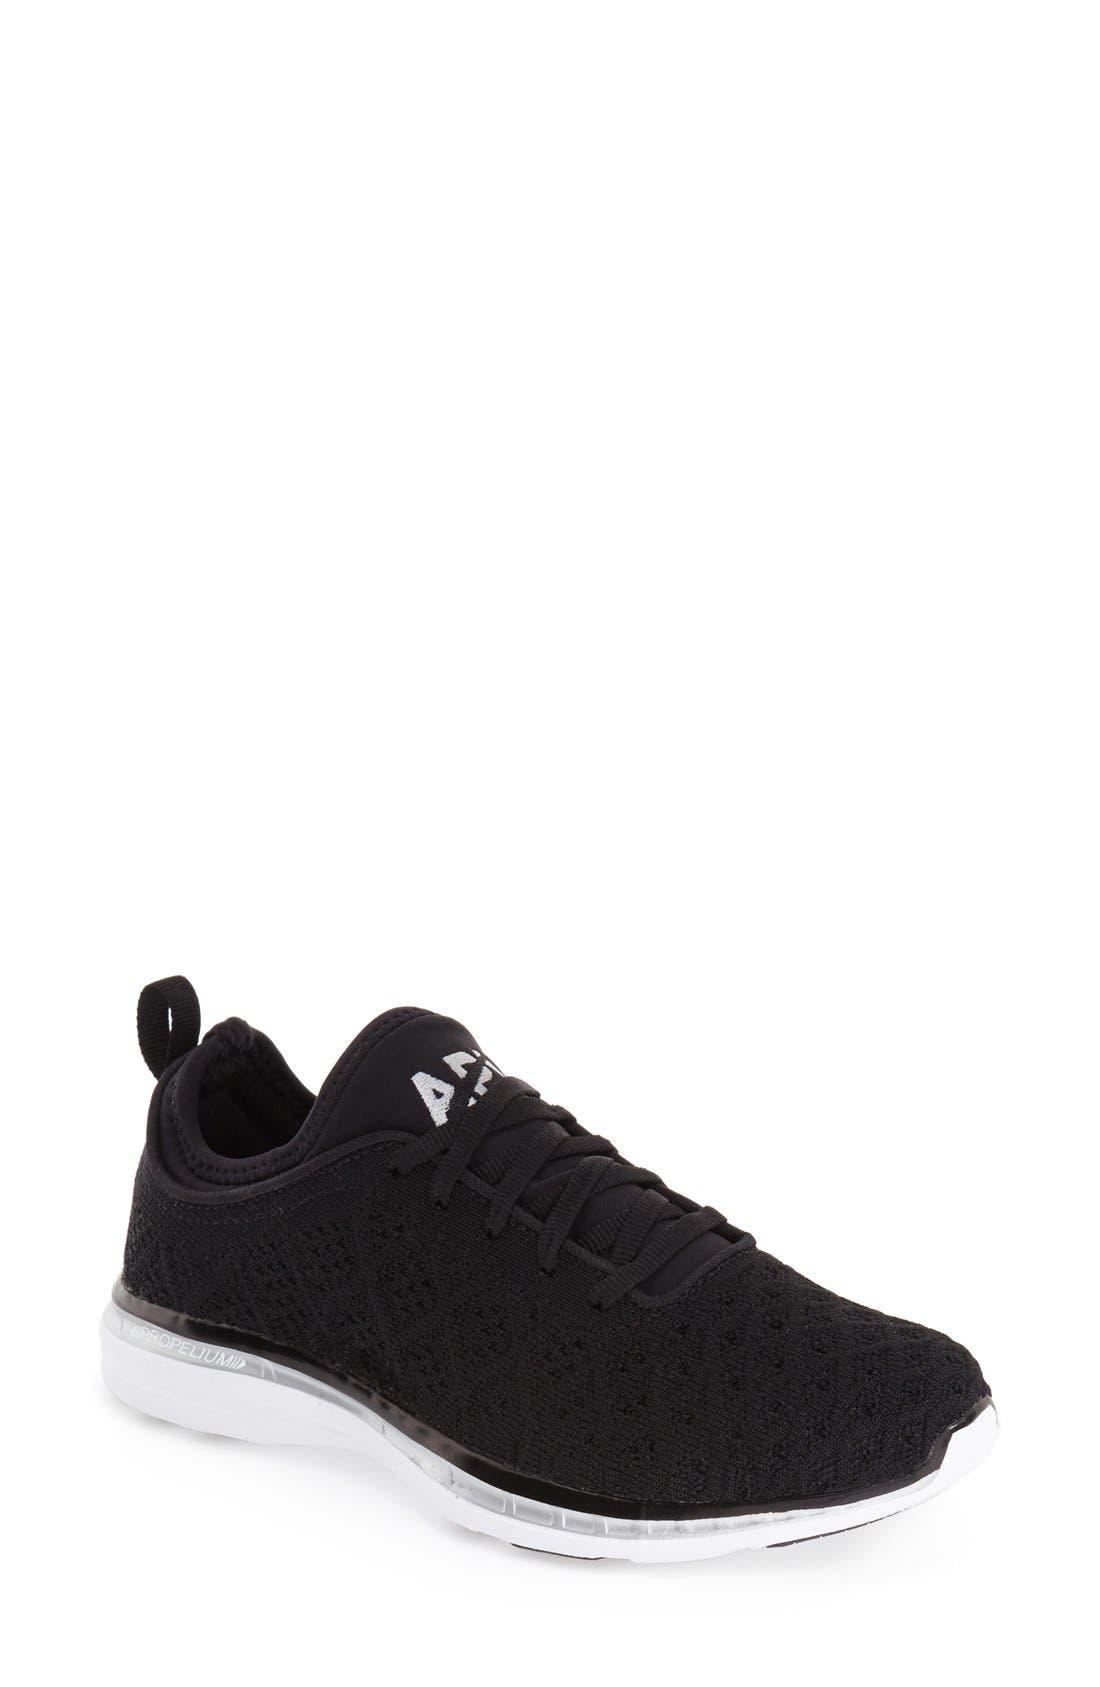 'TechLoom Phantom' Running Shoe, Main, color, 001